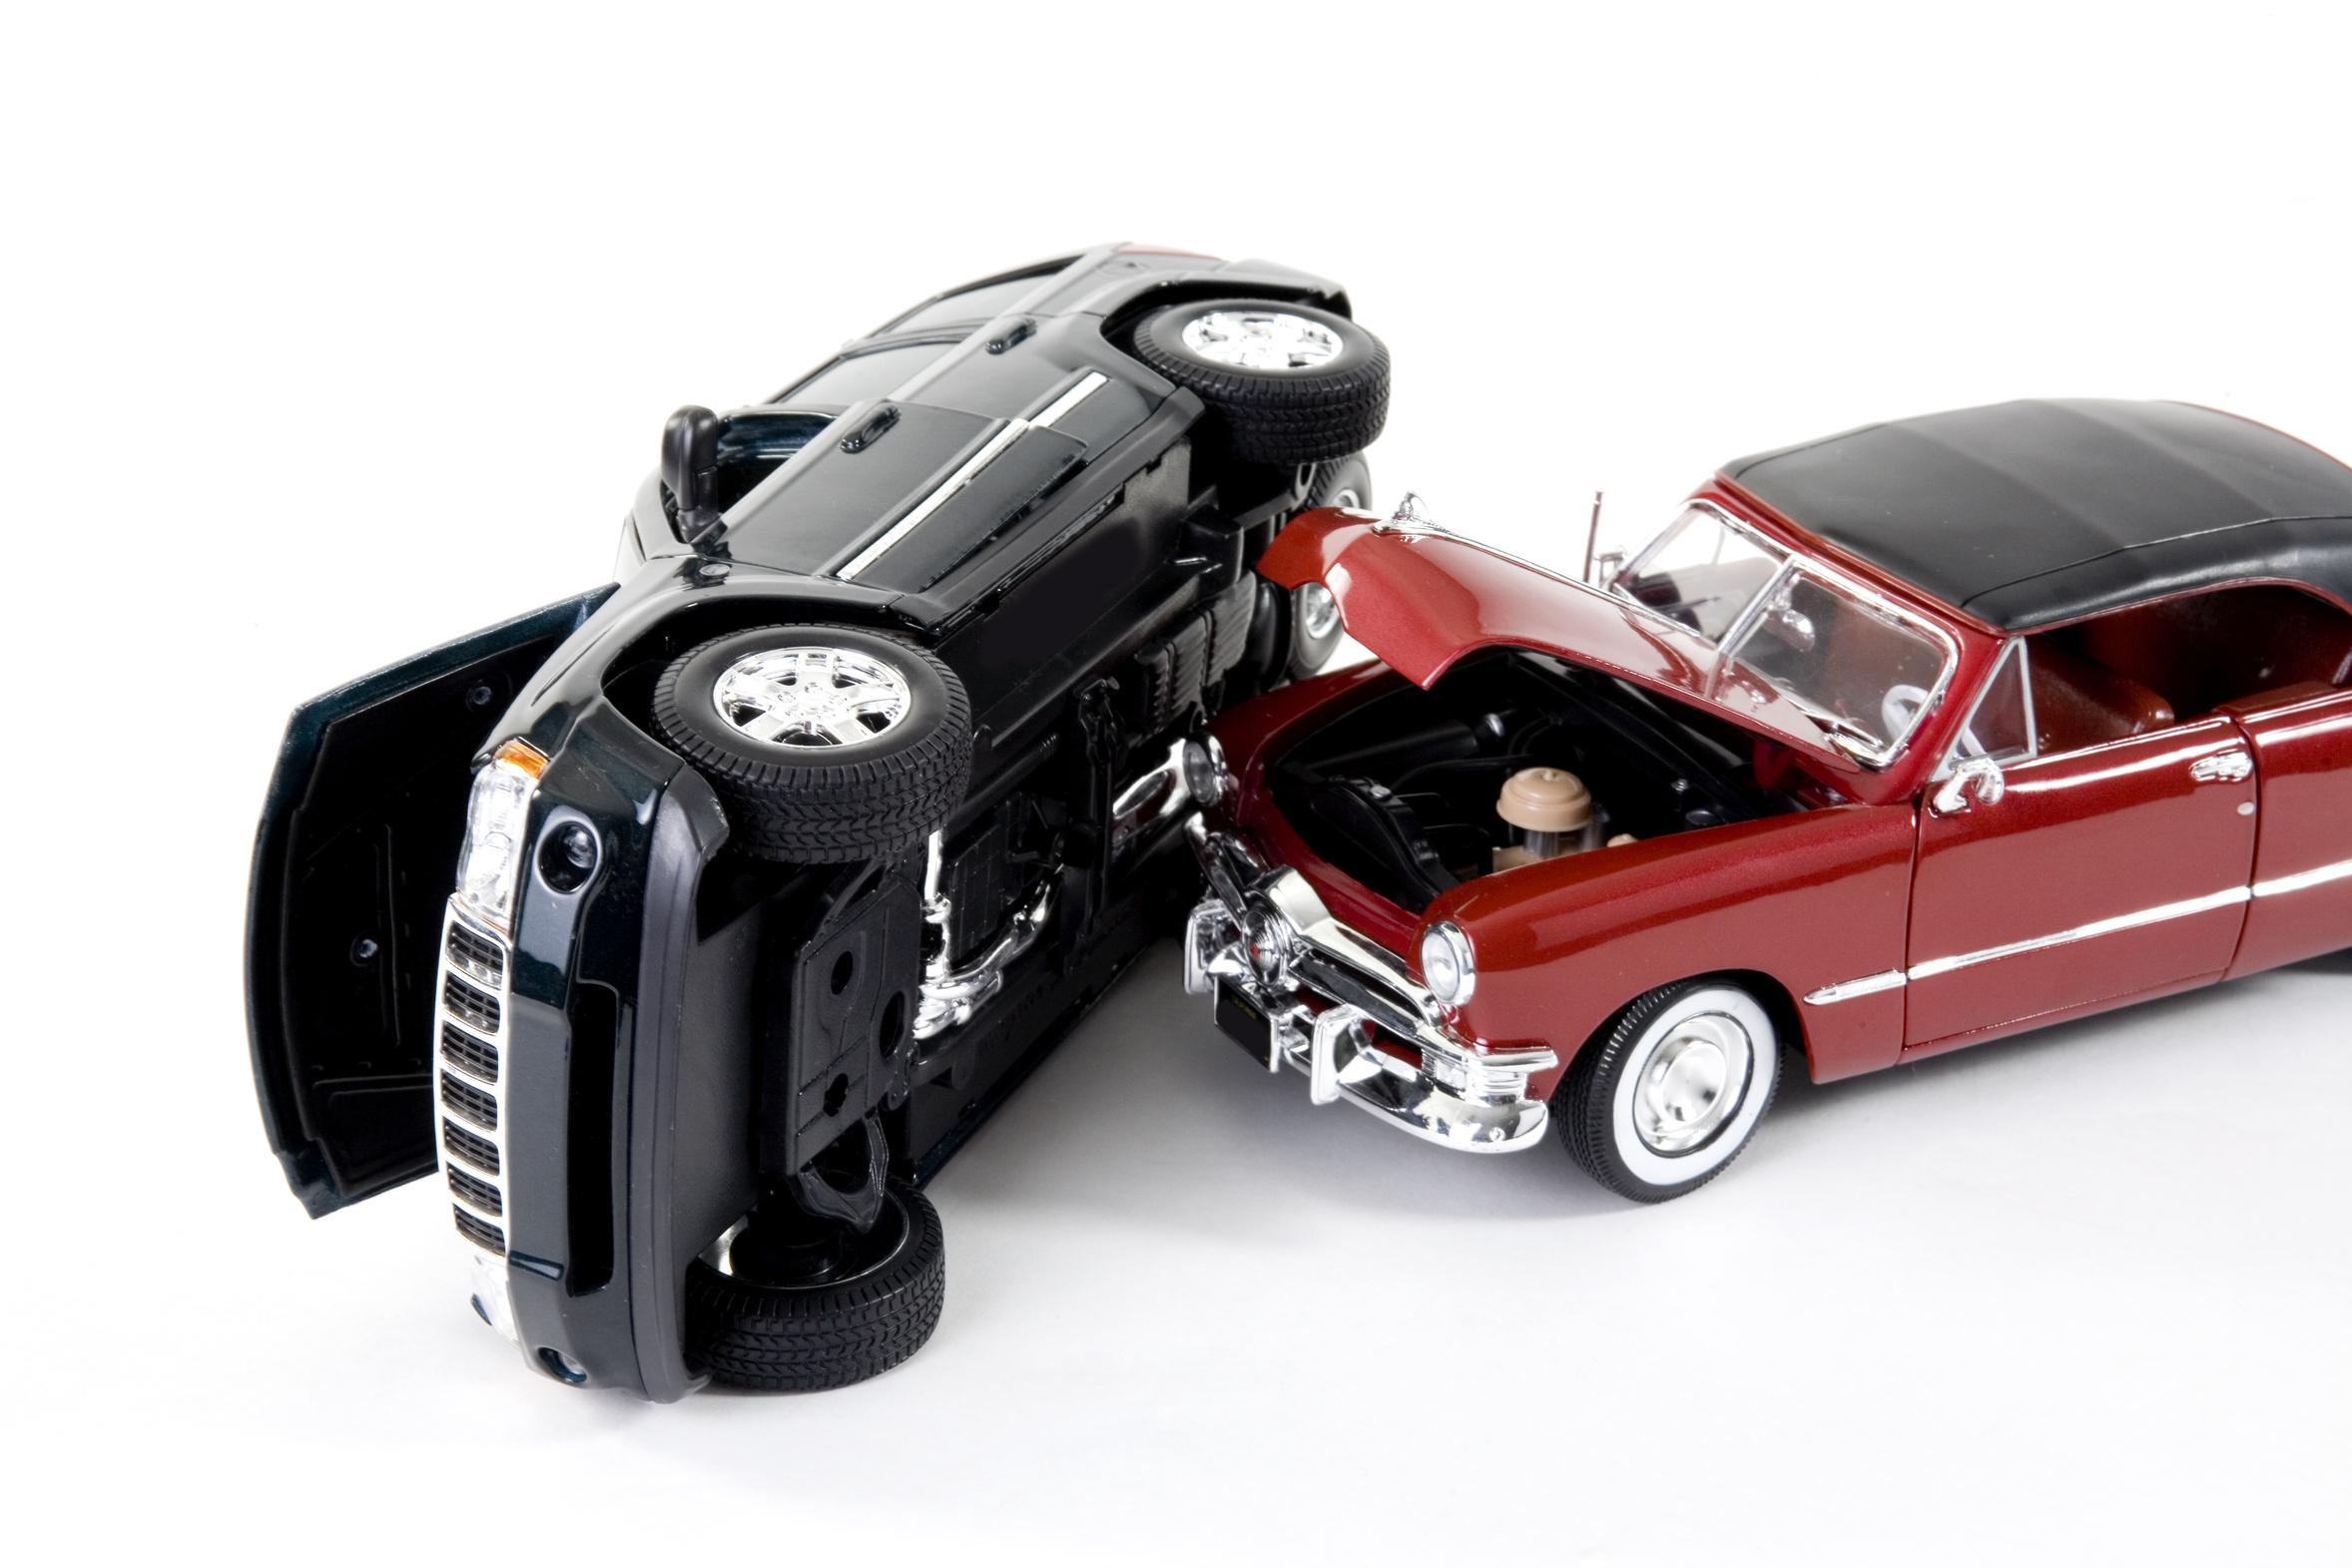 Low risk car